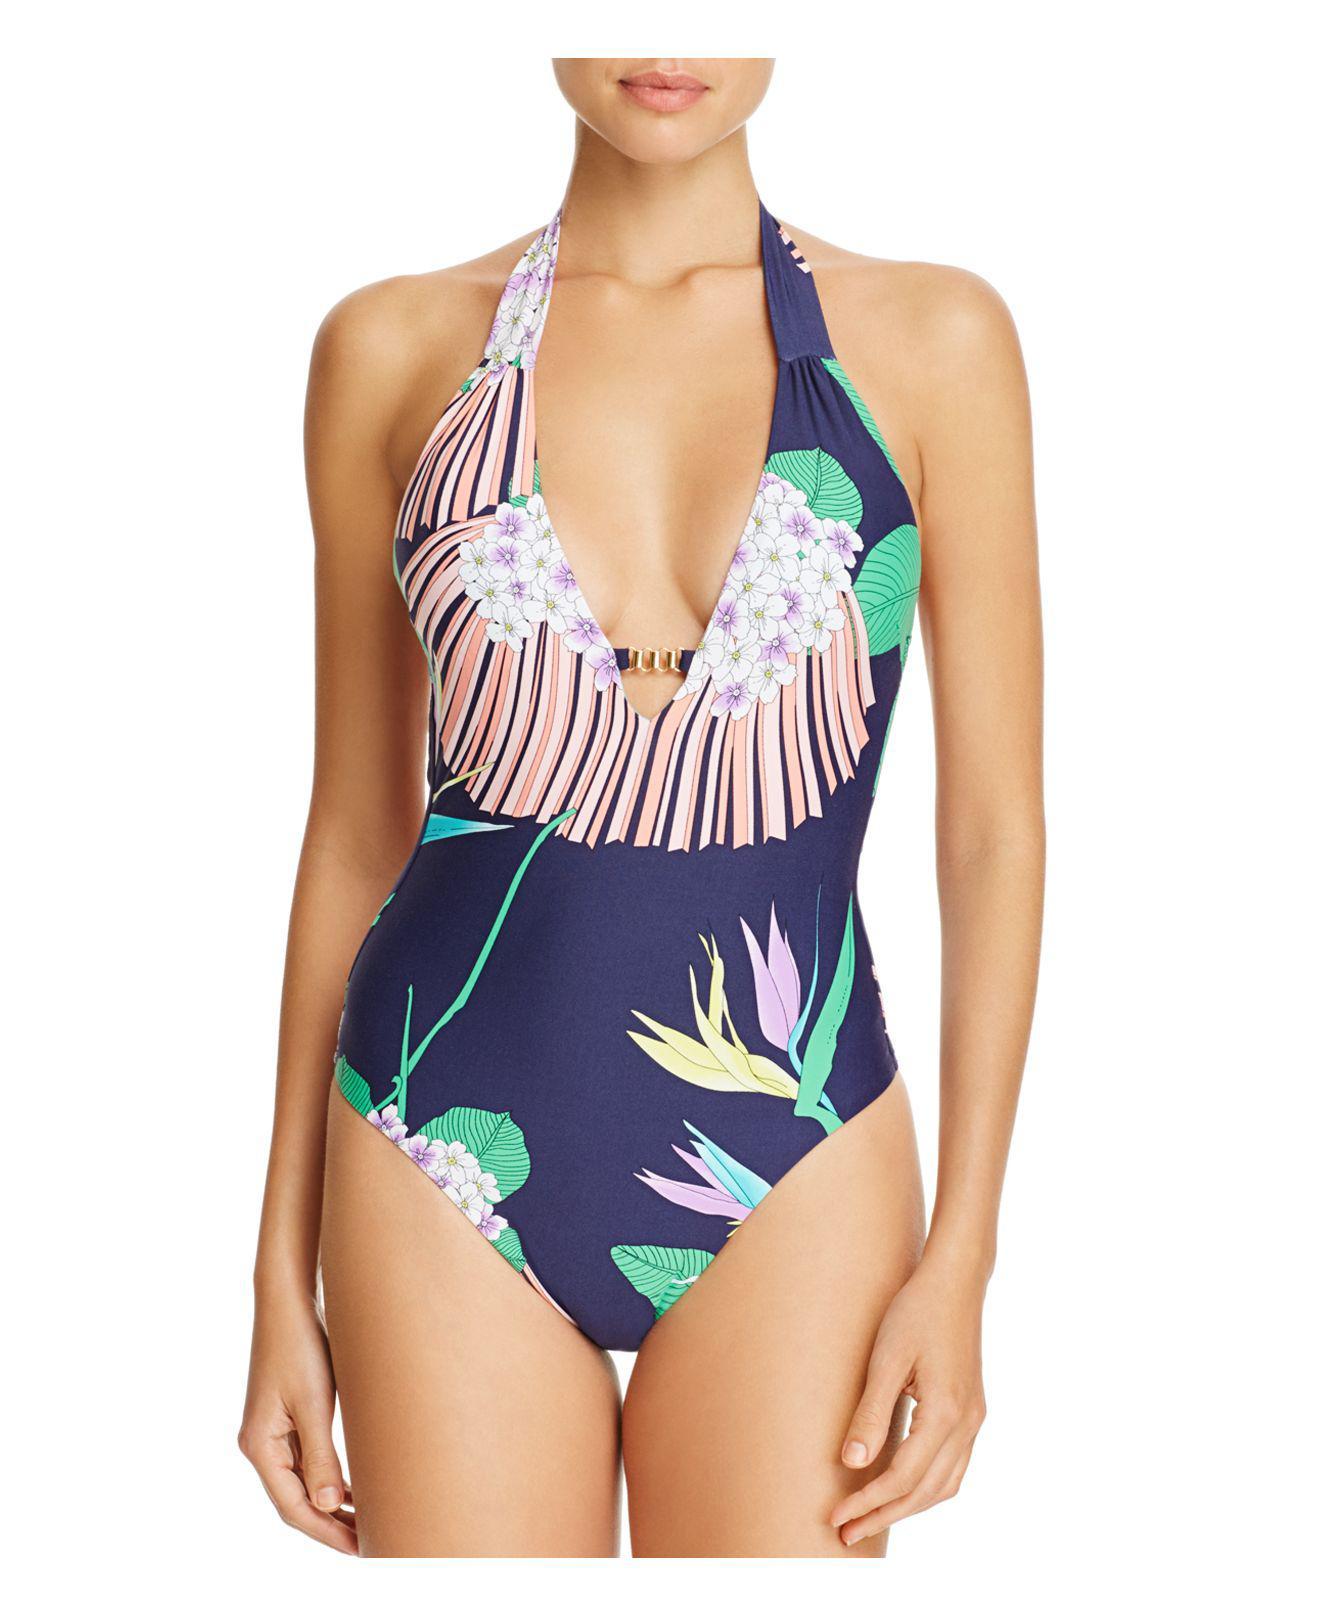 f94edca6d4 Lyst - Trina Turk Midnight Paradise Plunge One Piece Swimsuit in Blue